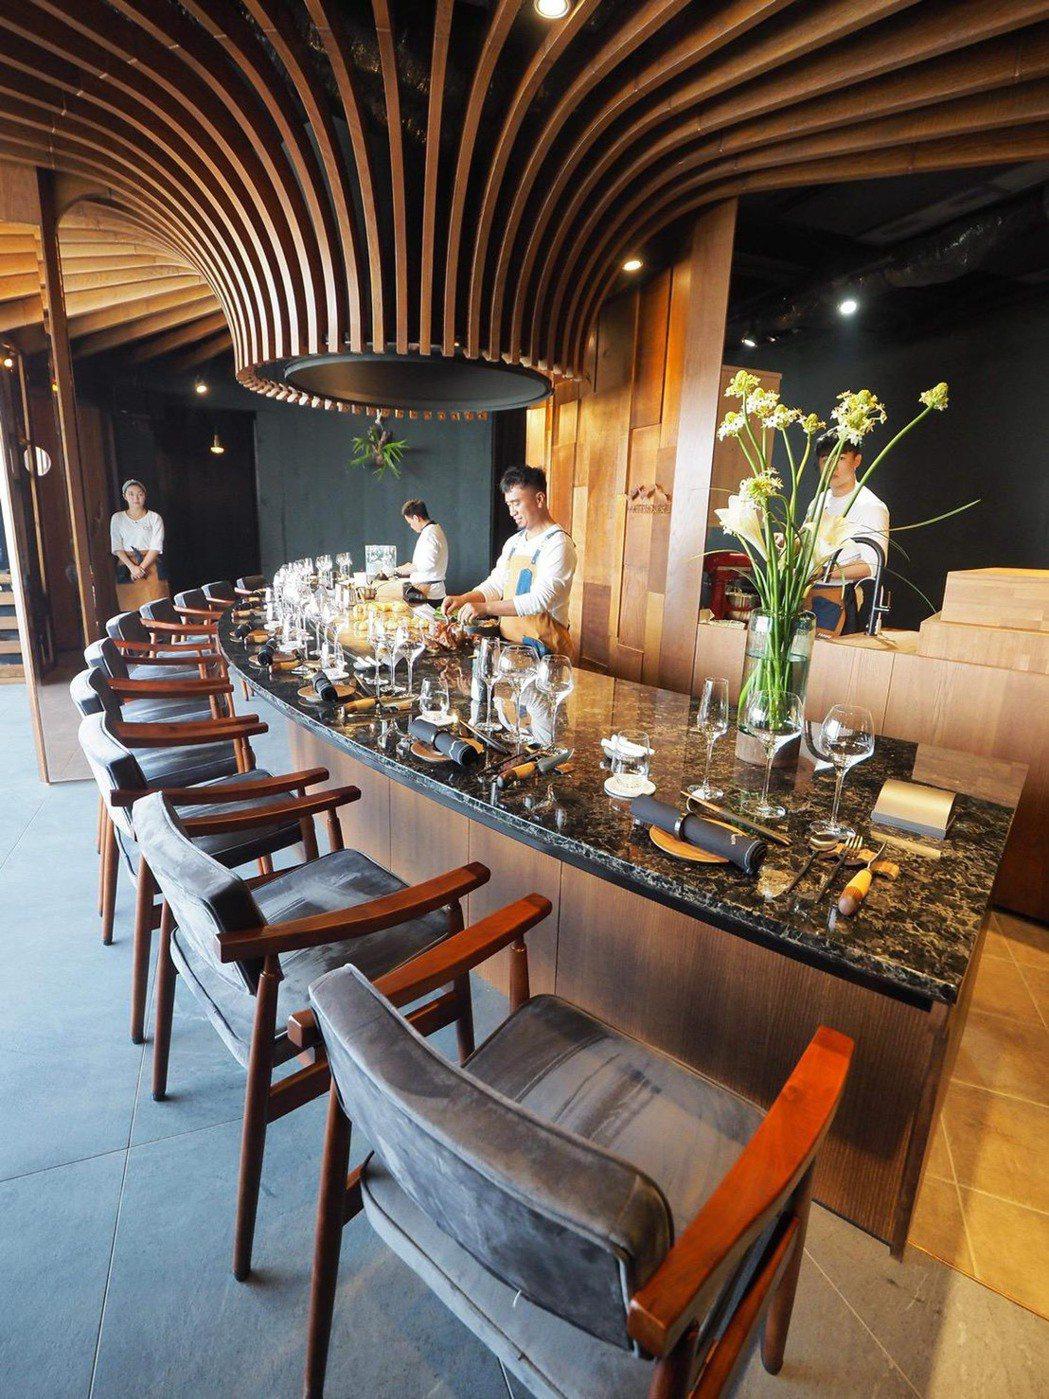 Mathariri餐廳設計時尚,現代且富有美感。圖/Peray Hsiao提供